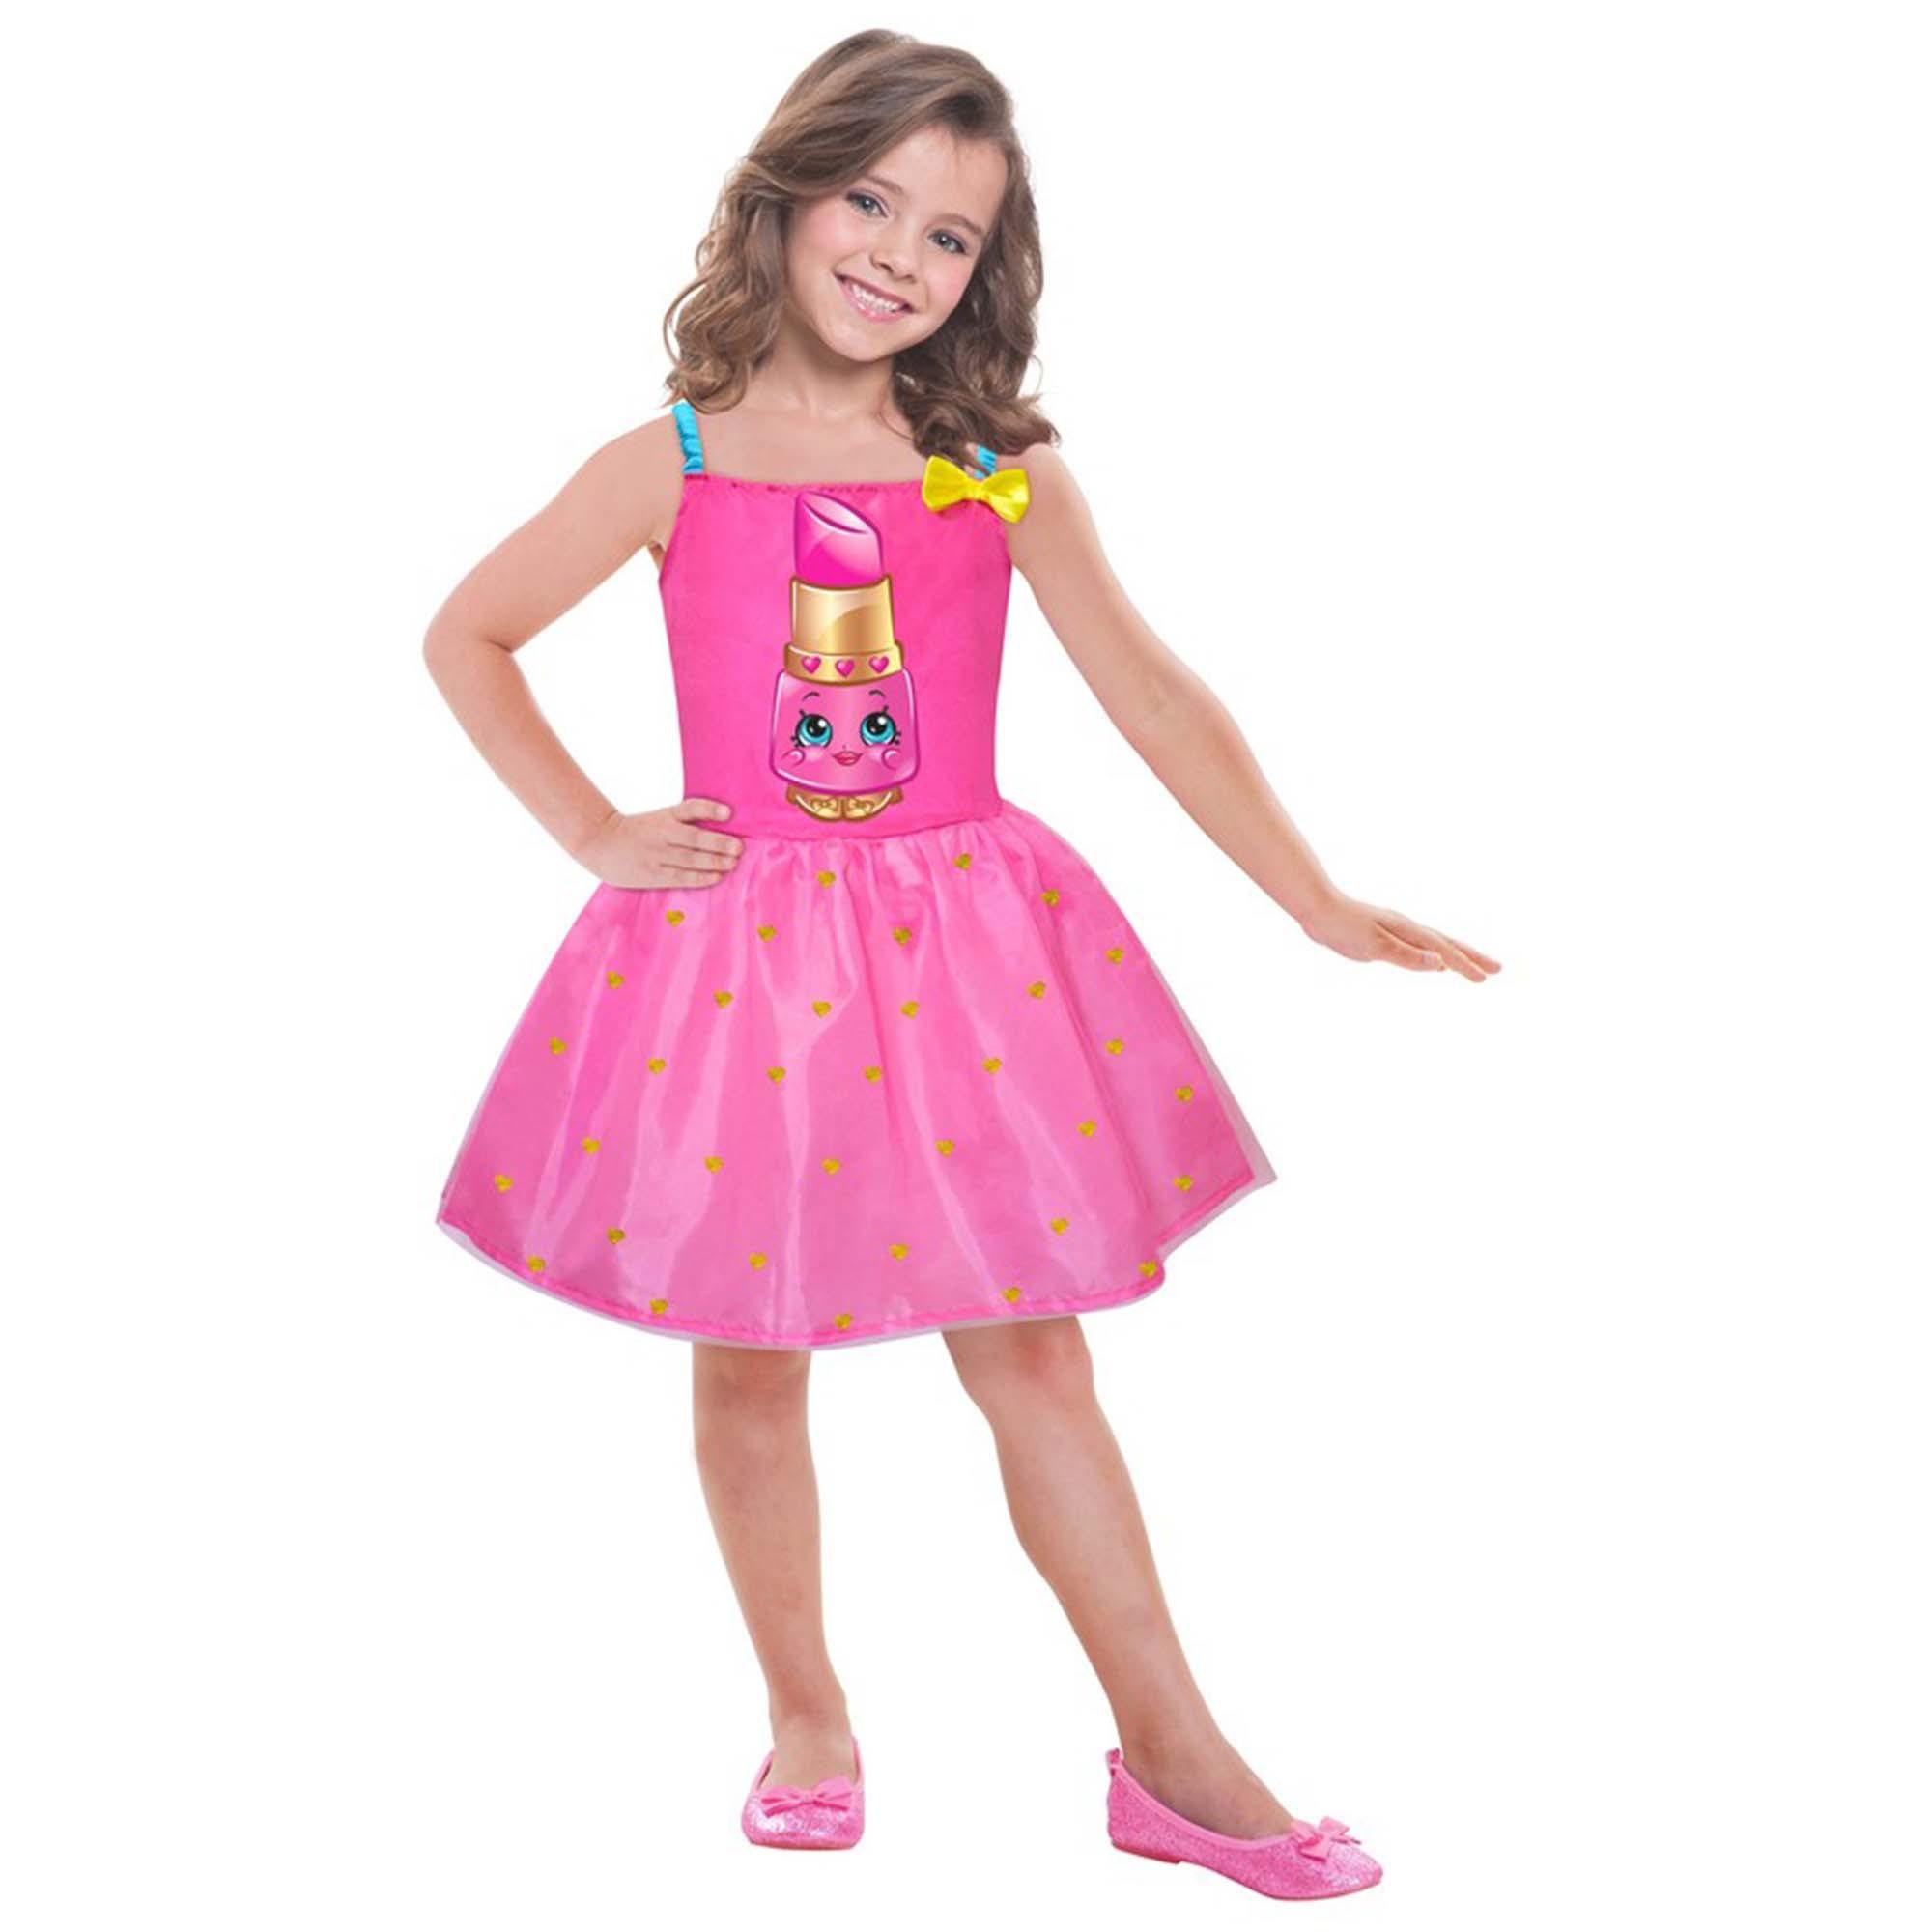 Shopkins Lippy Costume 8-10 yrs